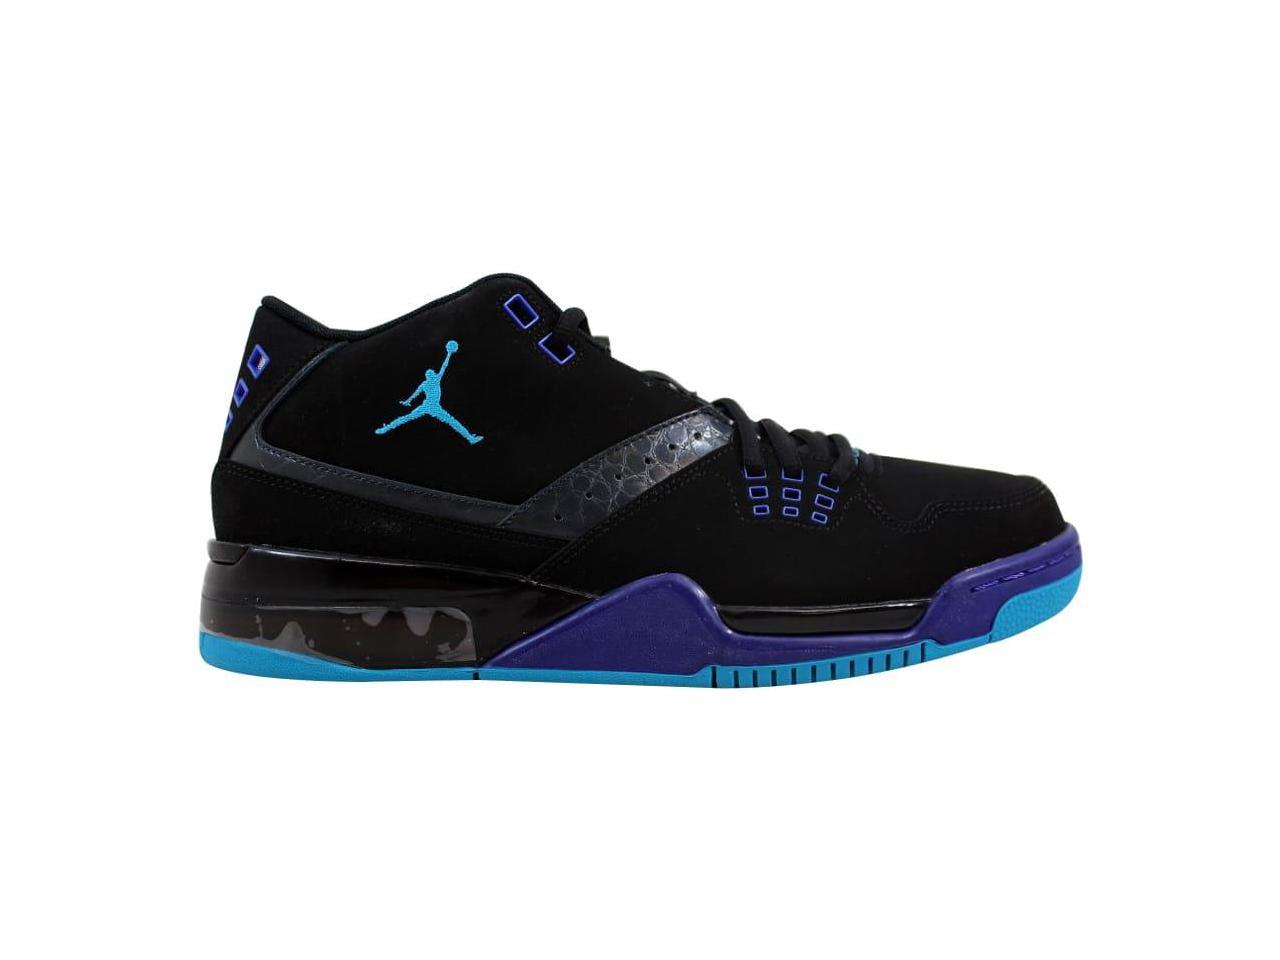 Nike Men's Air Jordan Flight 317820-013 23 Black/Blue Lagoon-Anthracite-Bright Concord 317820-013 Flight Size 10 5395ea